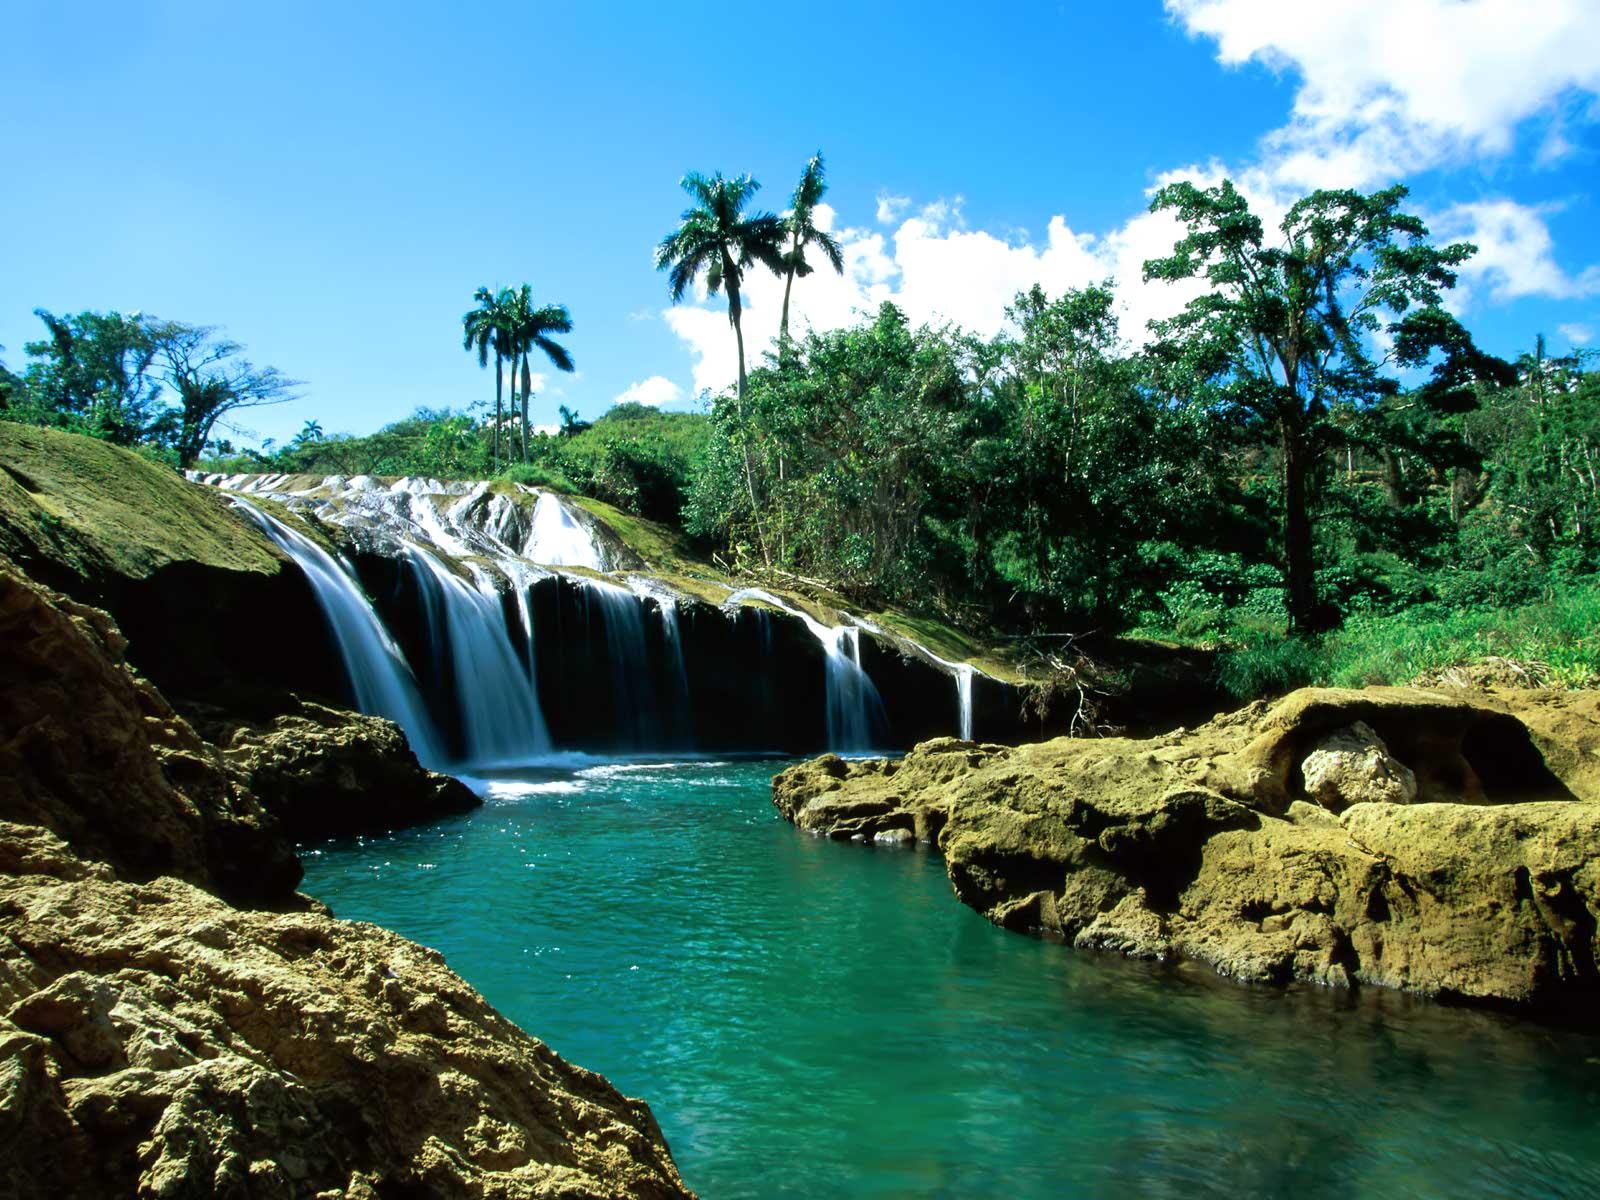 http://1.bp.blogspot.com/_t9fGCa5BVFo/S7OCe3eQXnI/AAAAAAAAAB0/nz6ryb2Tggg/s1600/El_Nicho_Falls,_Cuba.jpg